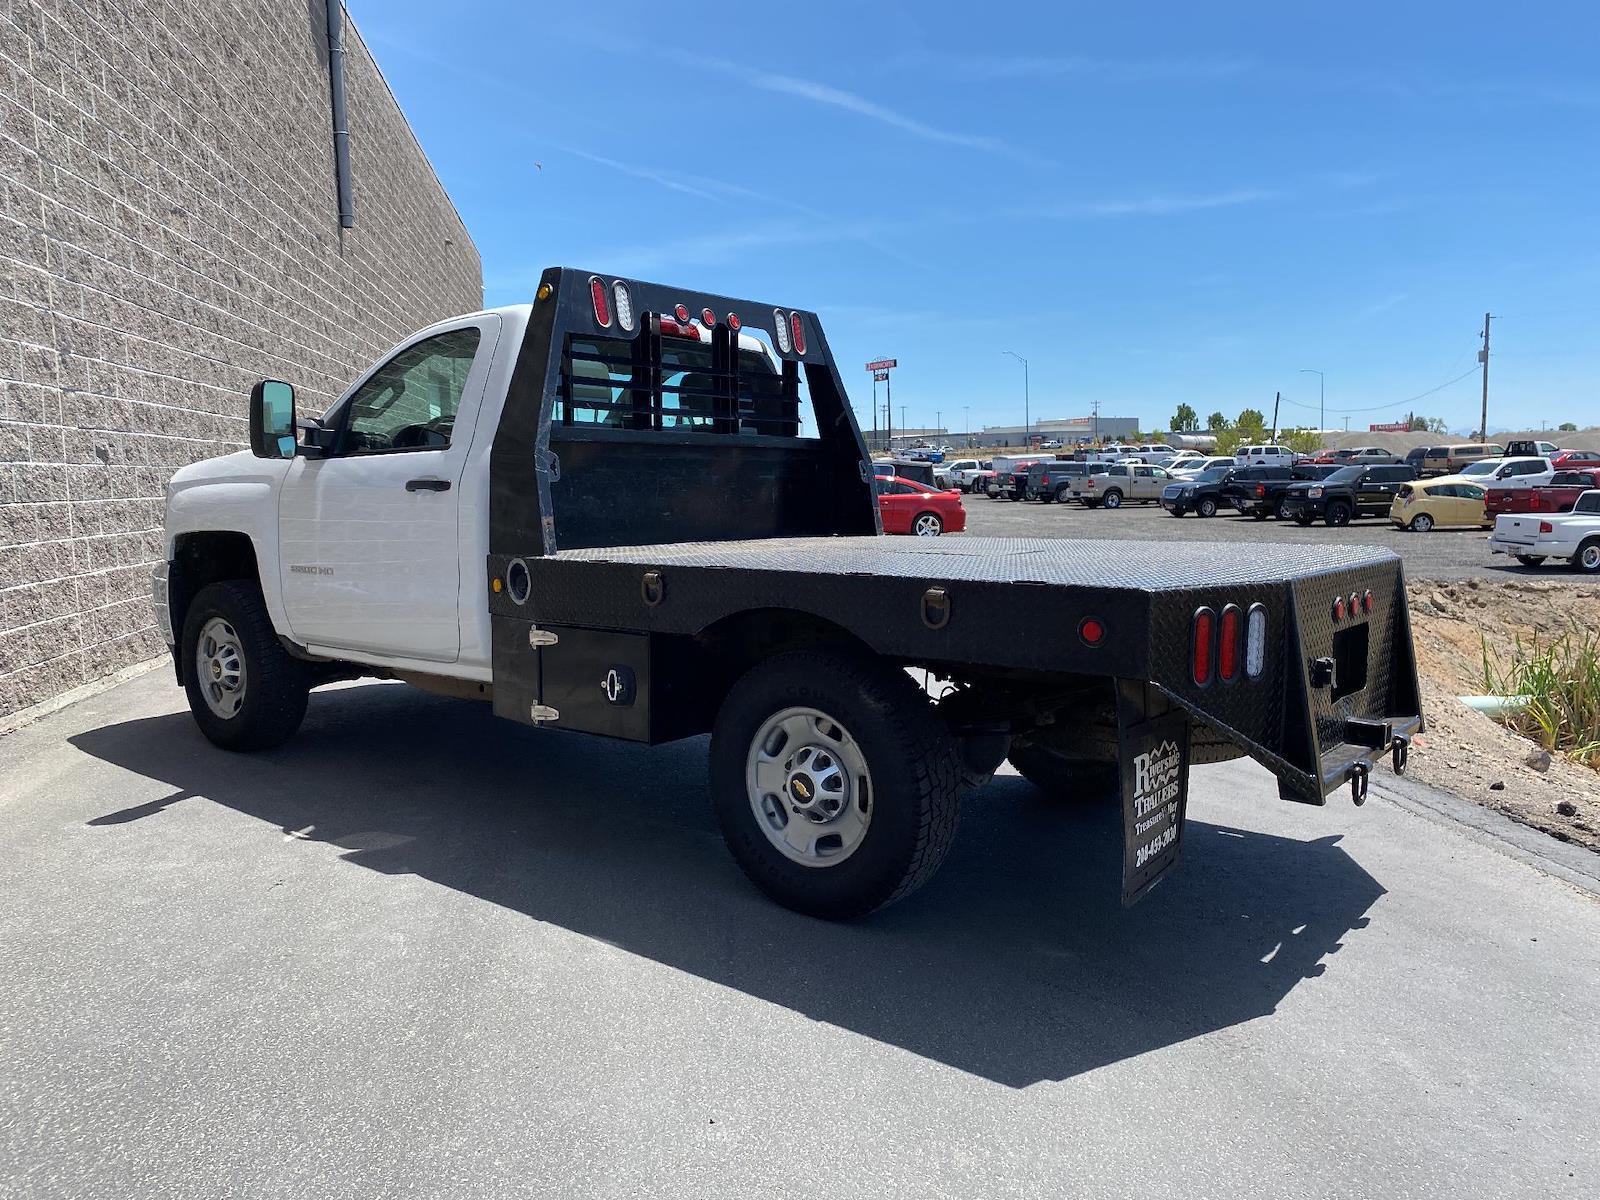 2018 Chevrolet Silverado 2500 Regular Cab 4x4, Platform Body #U6031 - photo 1